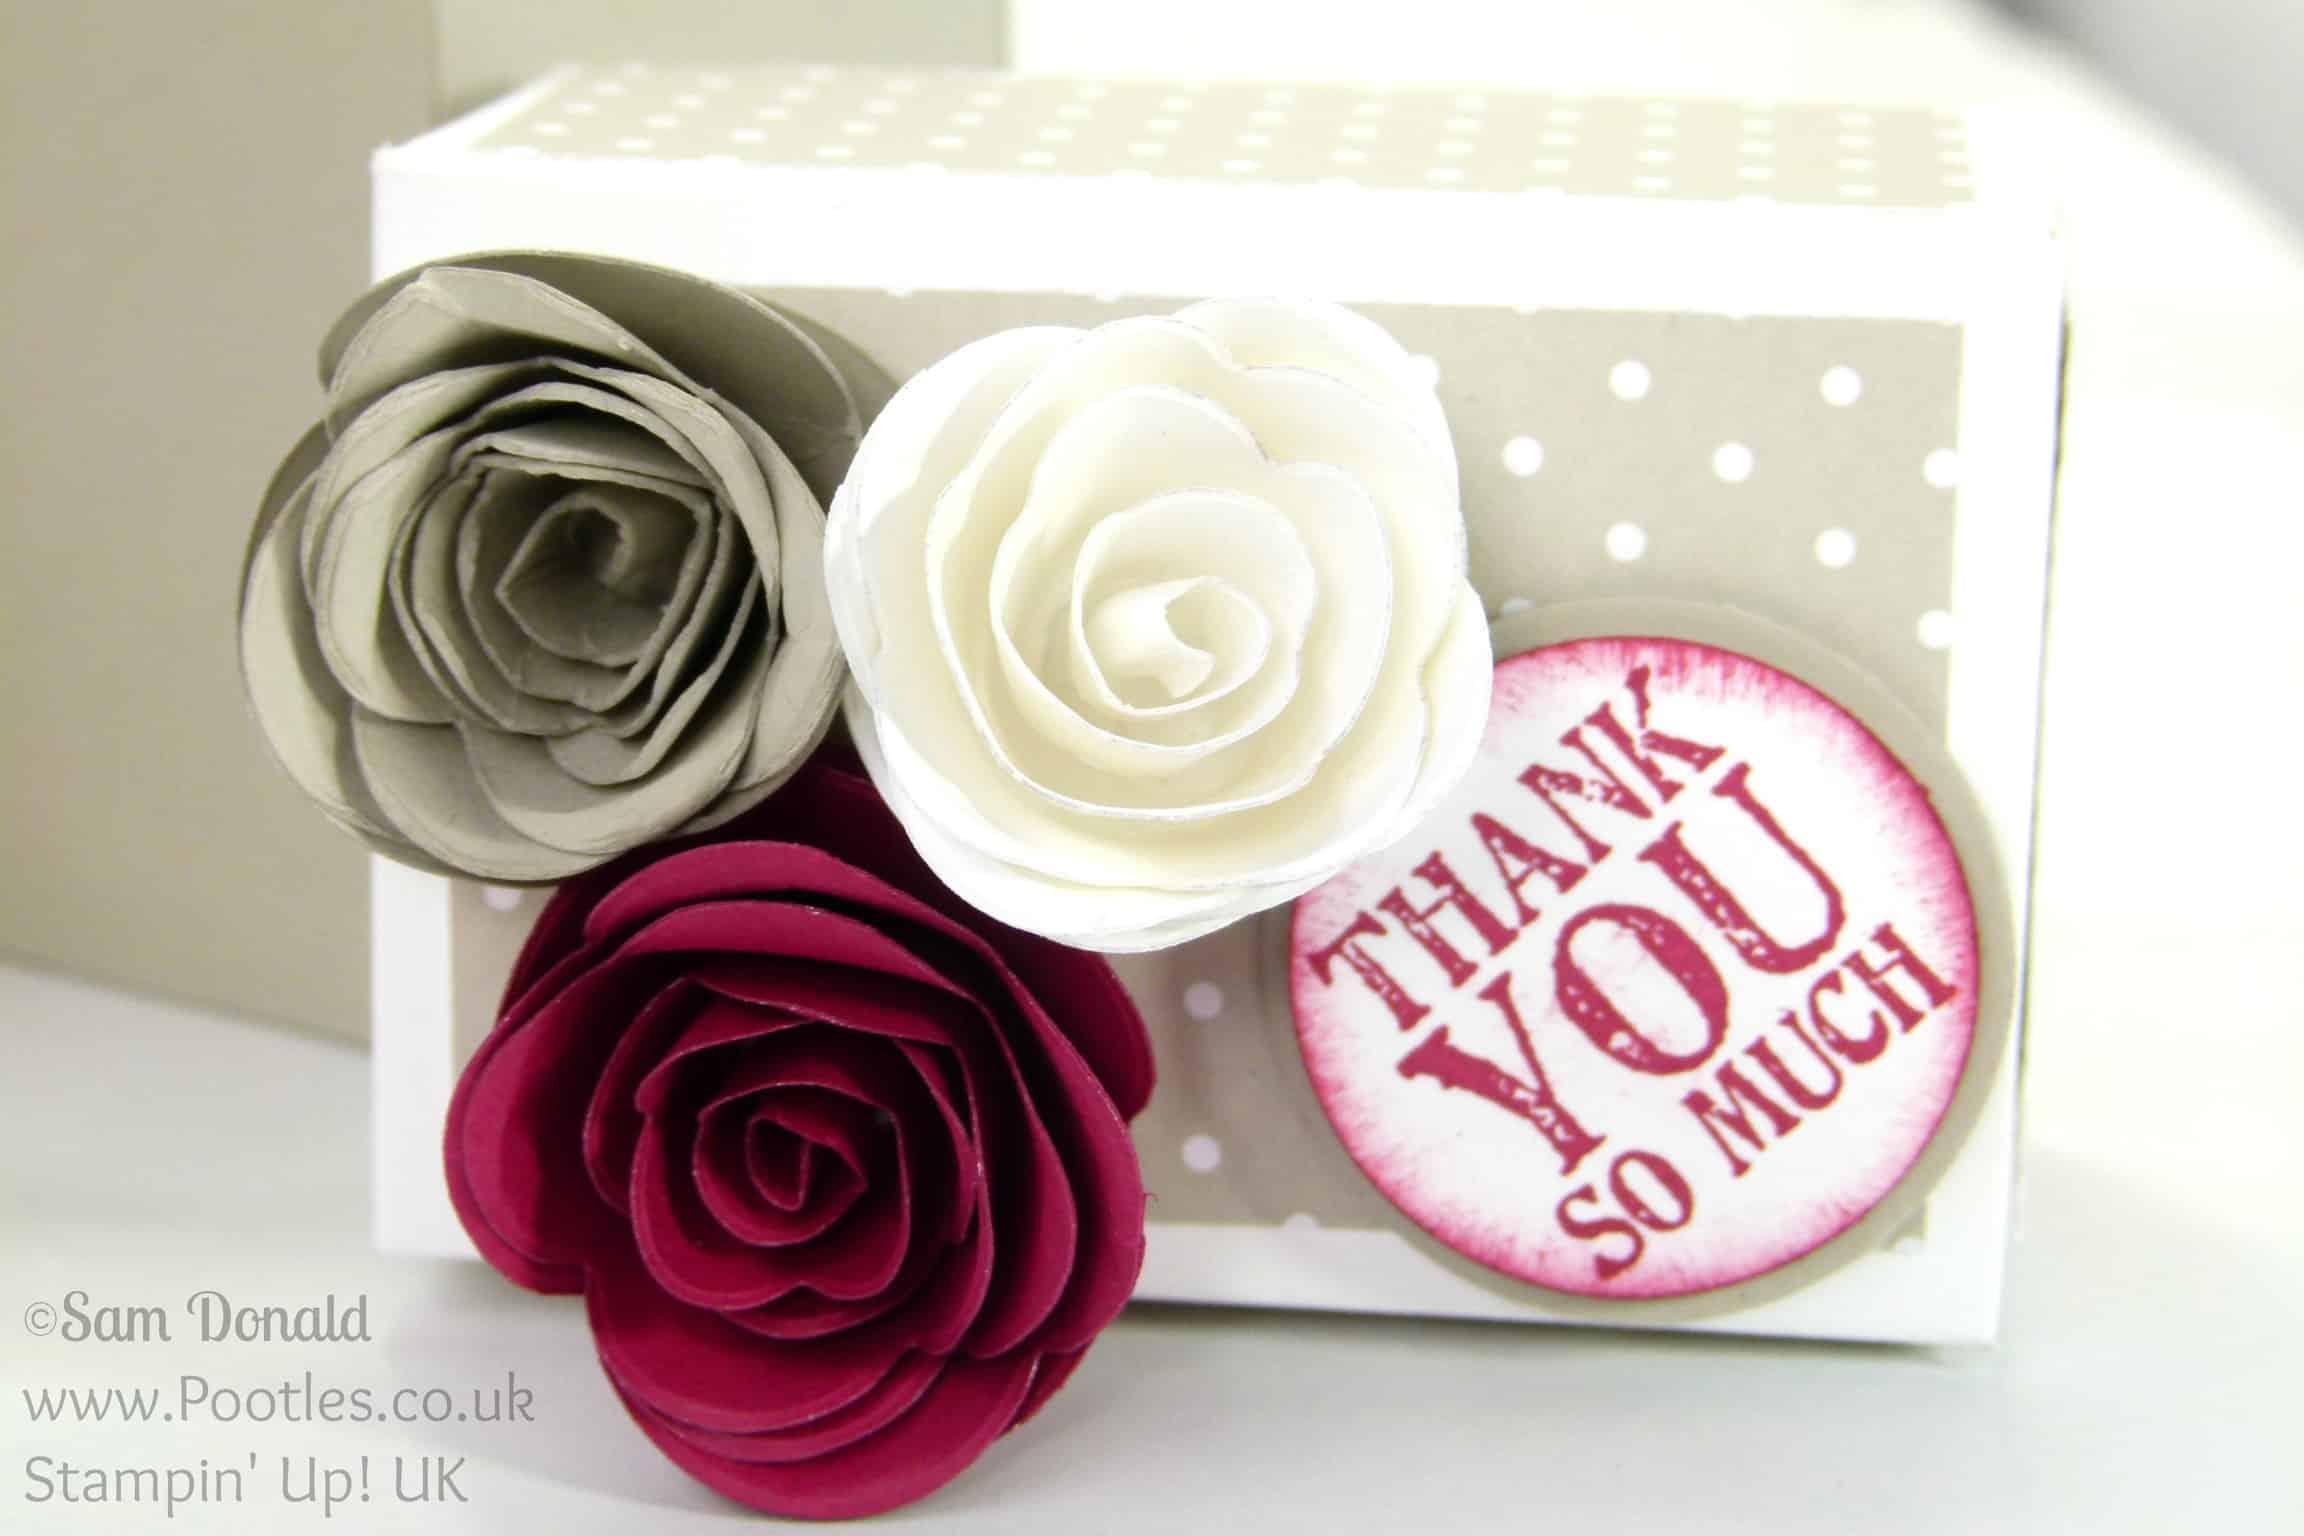 Stampin' Up! UK Demonstrator - Pootles. Rectangular Lidded Box Tutorial with Roses using Stampin' Up! Spiral Flower Die Close Up